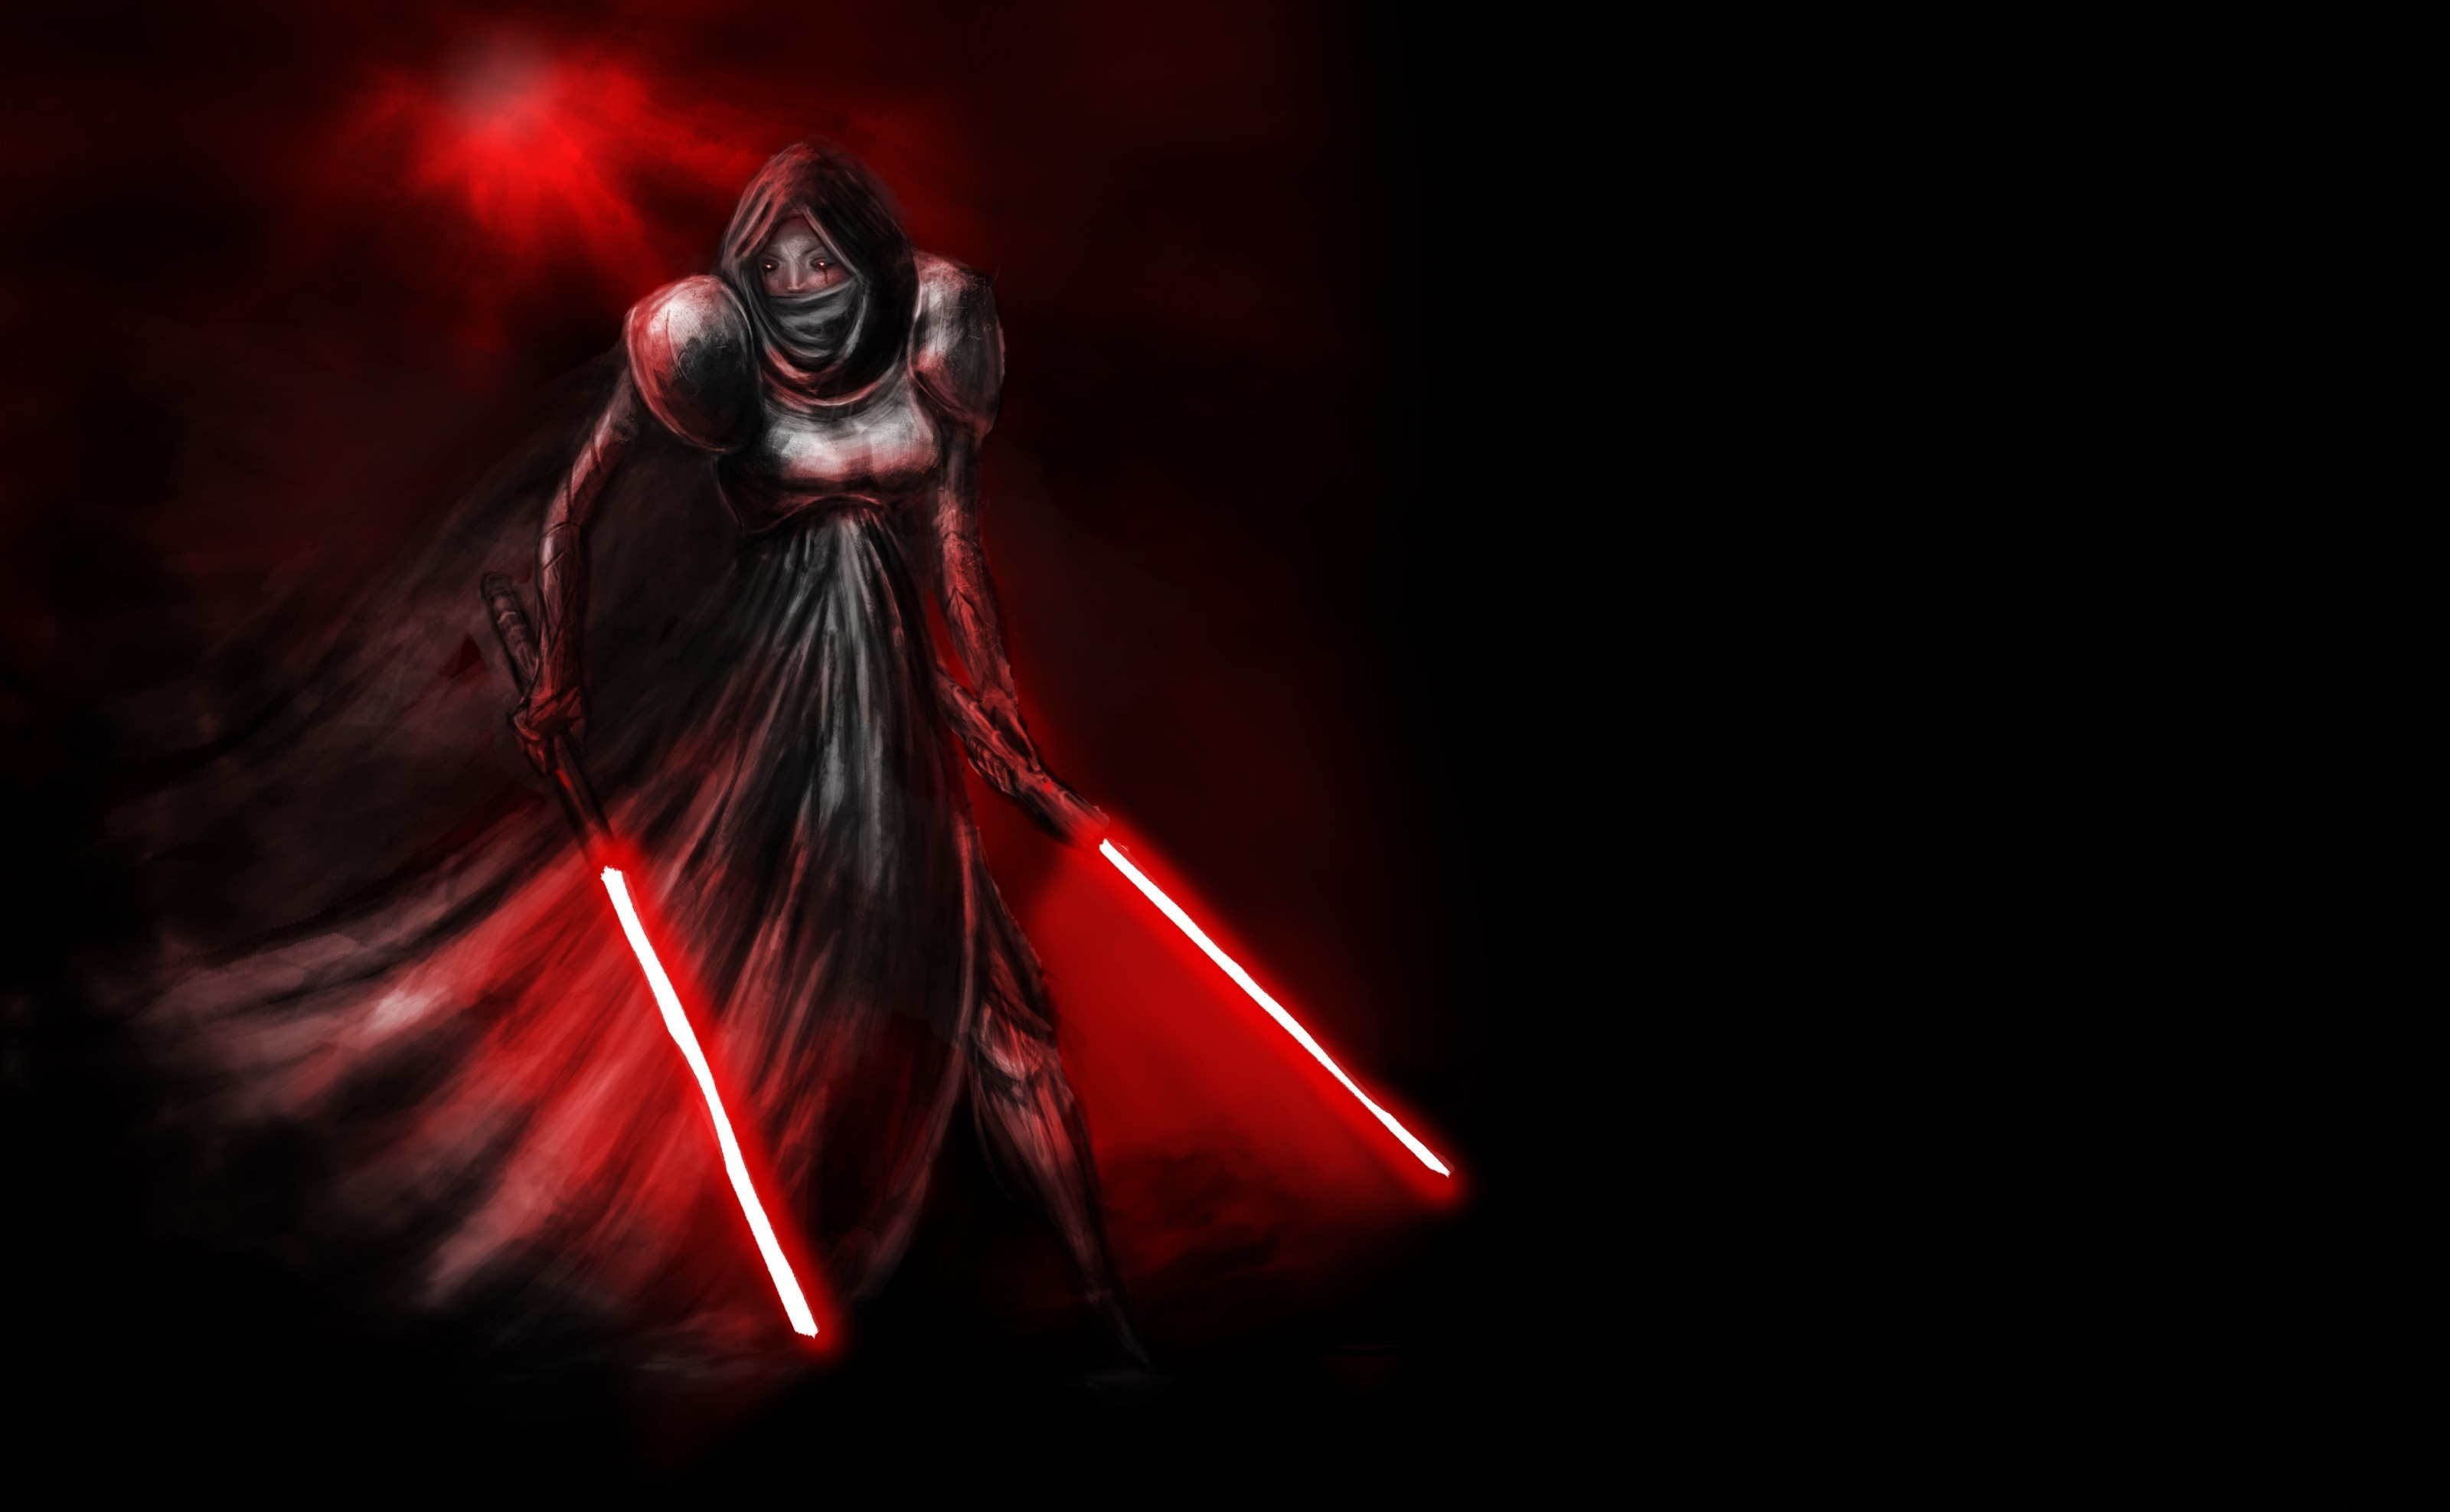 Lightsabers Star Wars Artwork …